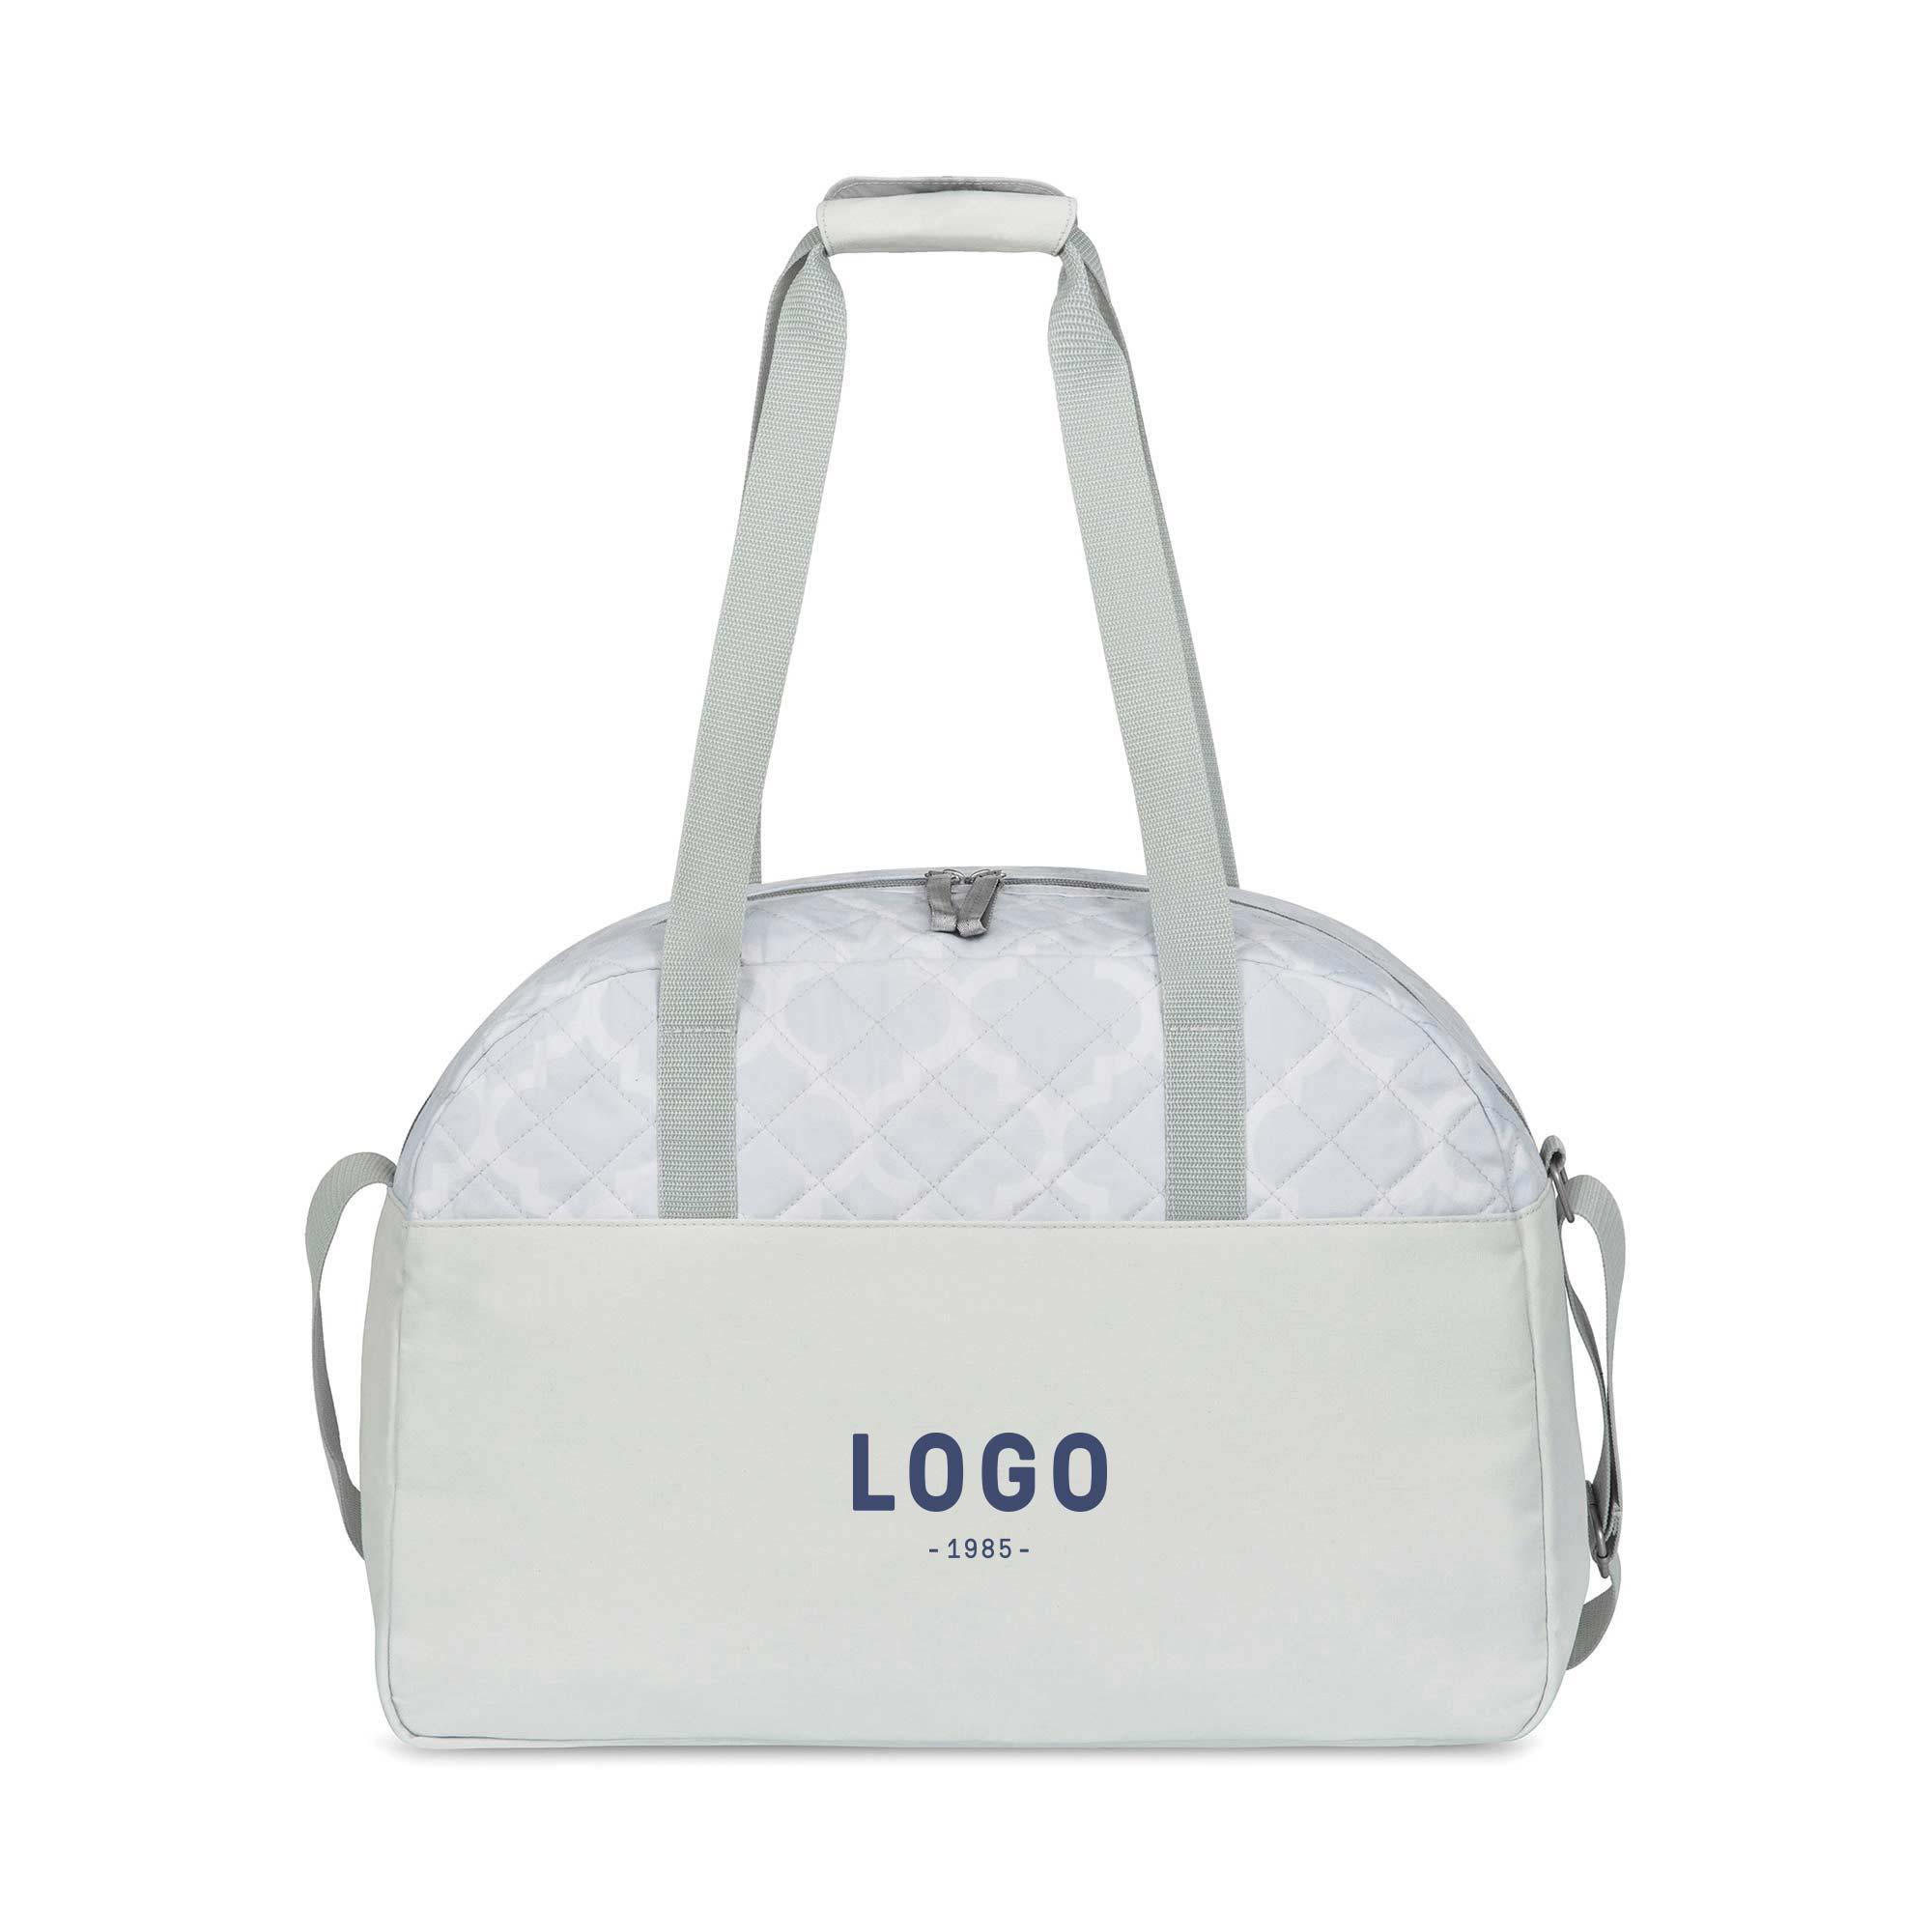 130187 rosalie quilted weekender bag one color imprint